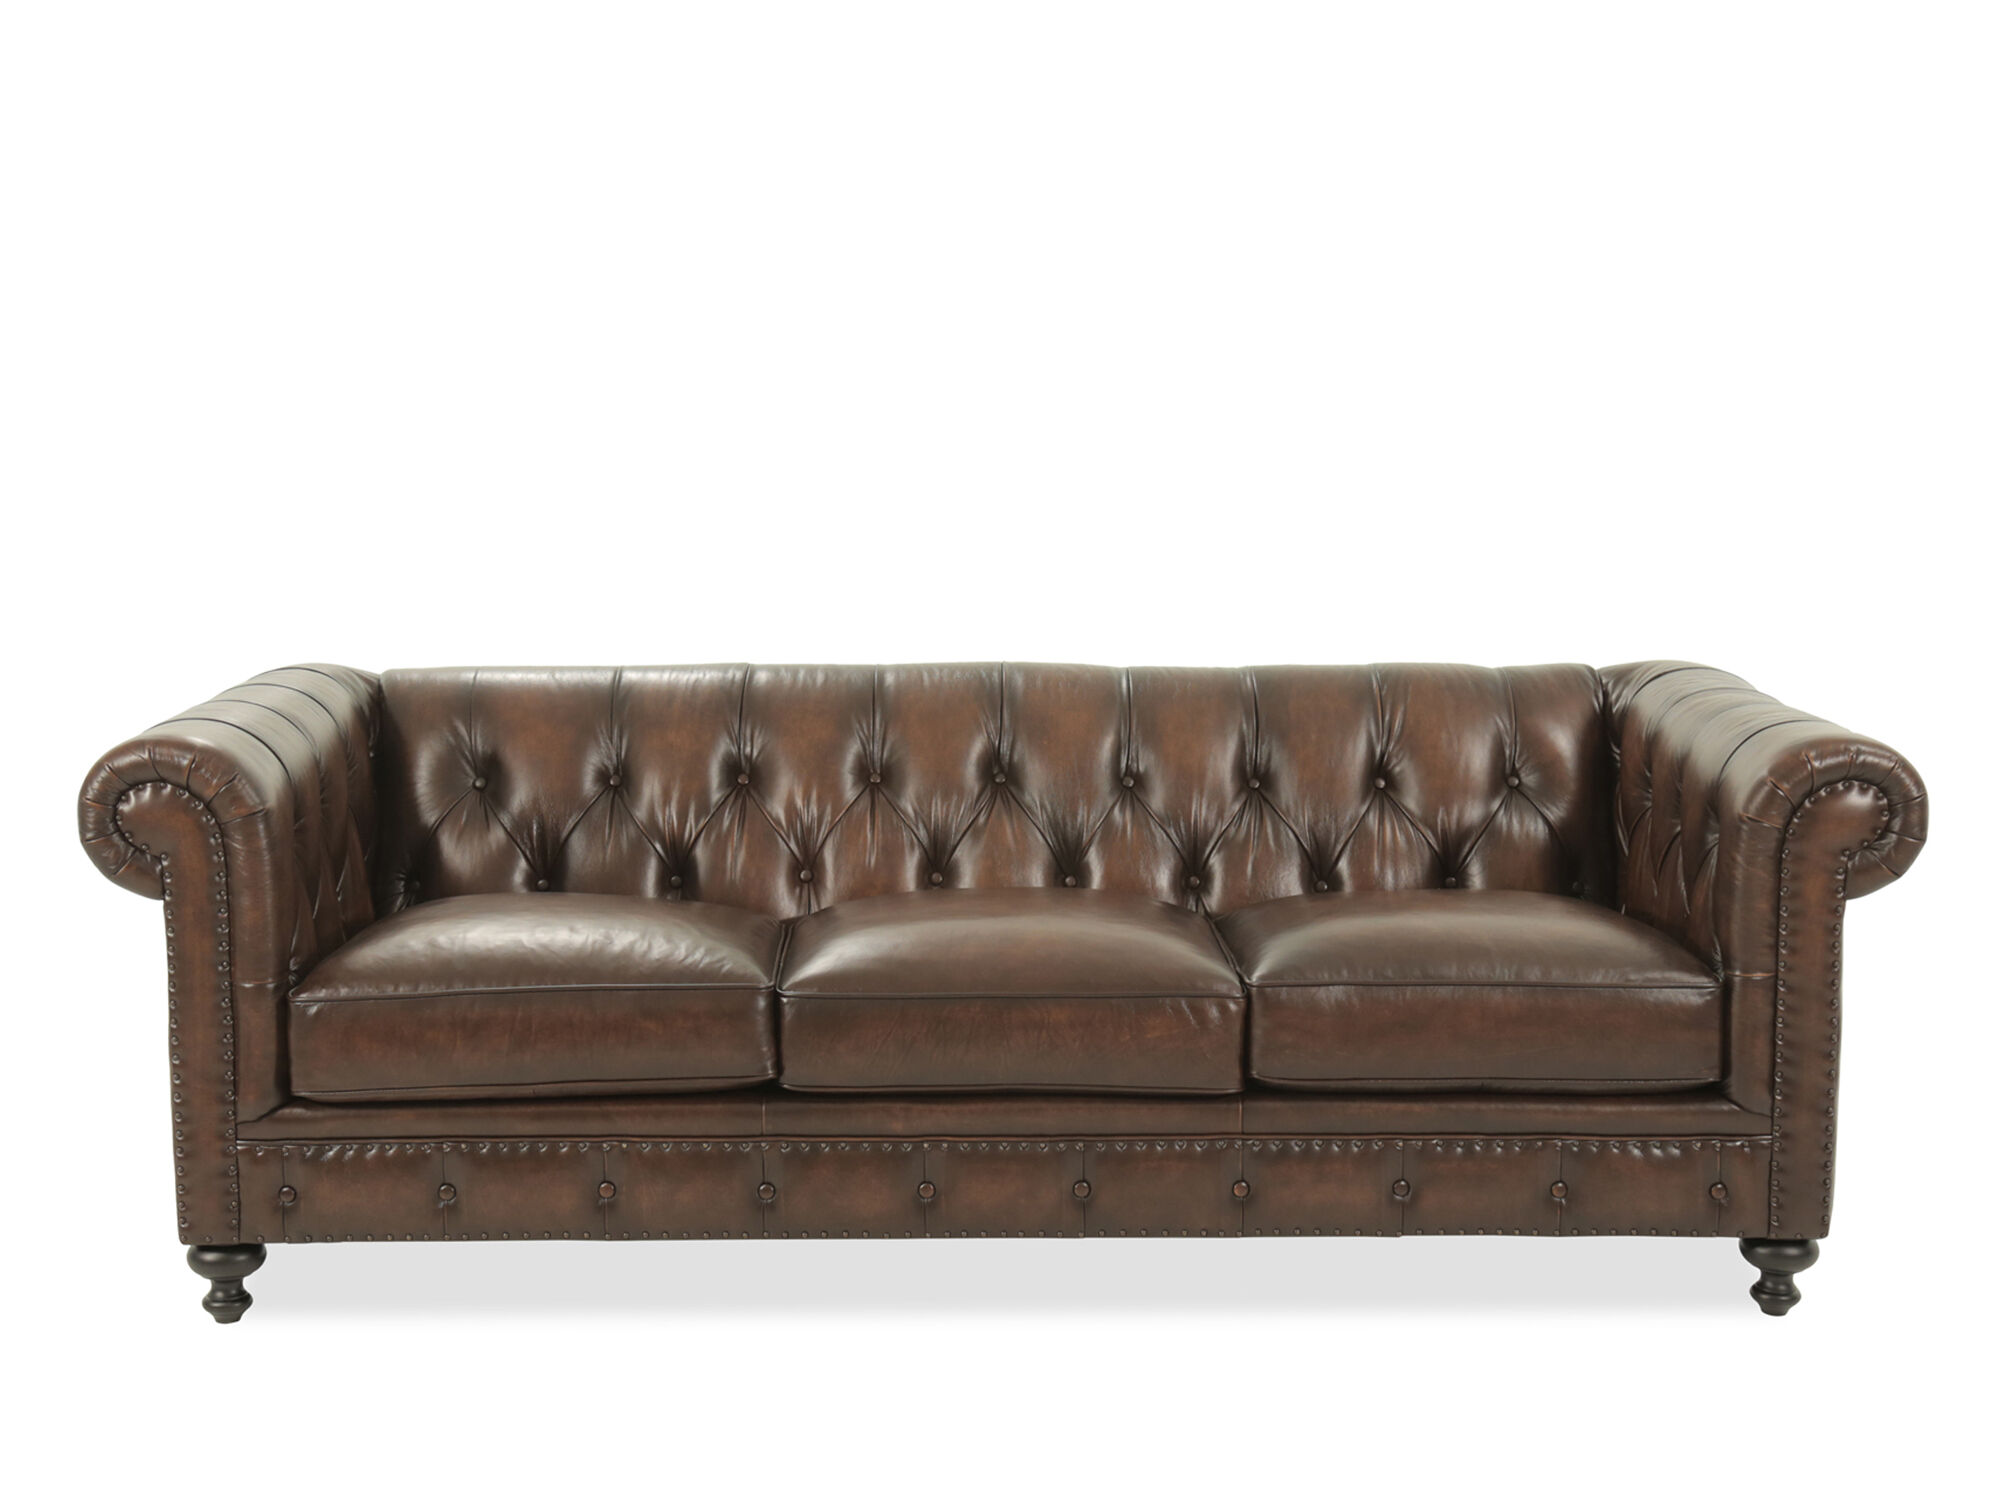 bernhardt brown leather club chair high for london dark sofa mathis